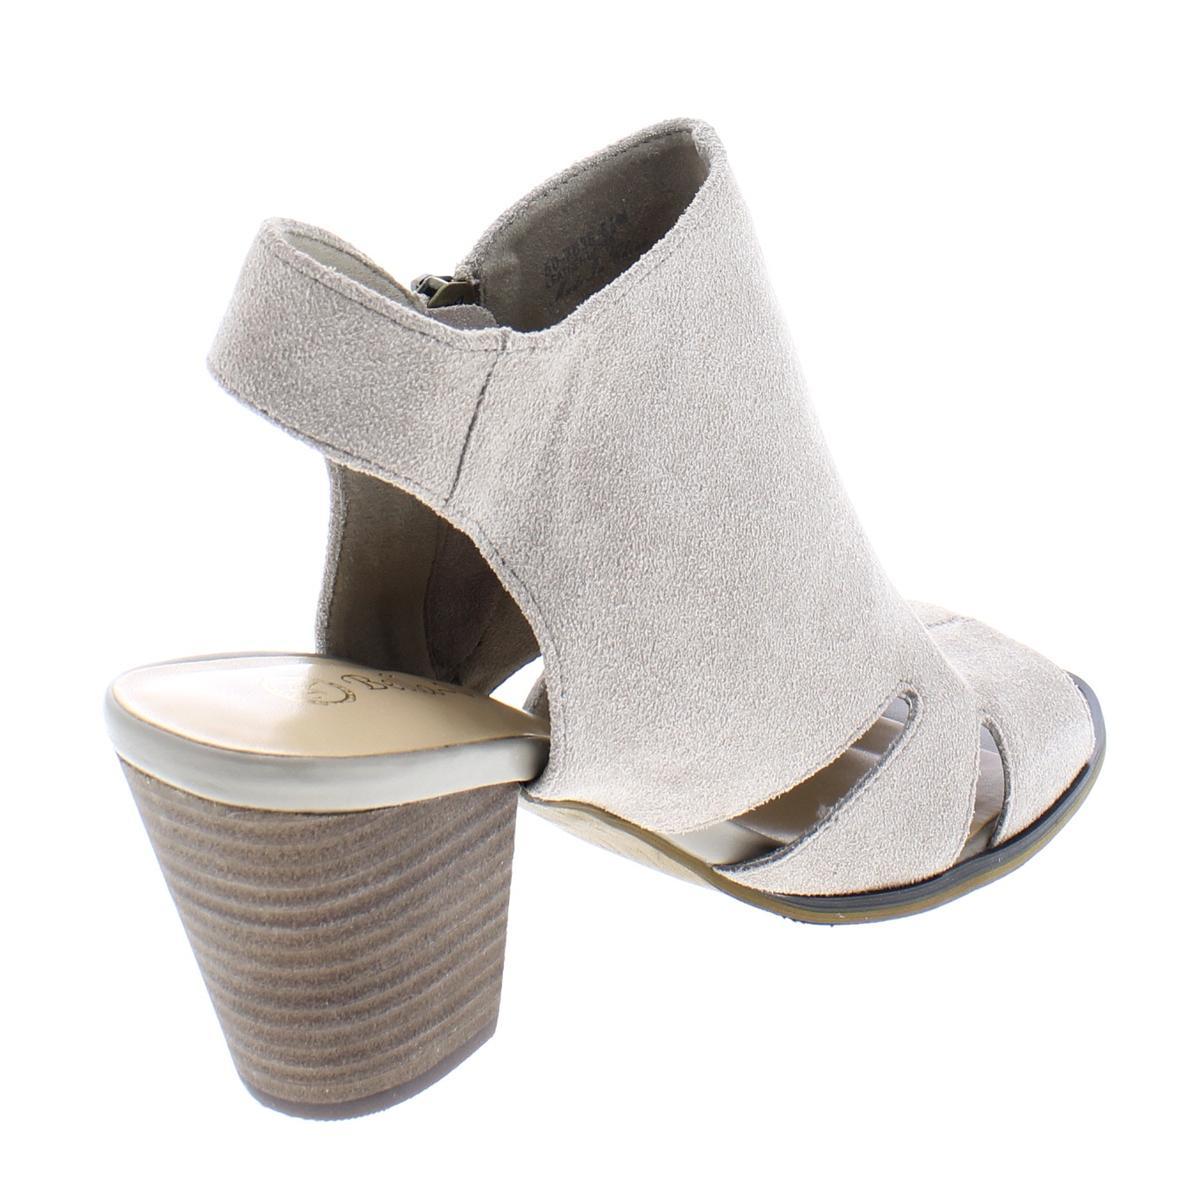 0cf5ad27c4e Bella Vita Womens Kimmy Block Heel Cut-Out Wedge Sandals Shoes BHFO ...